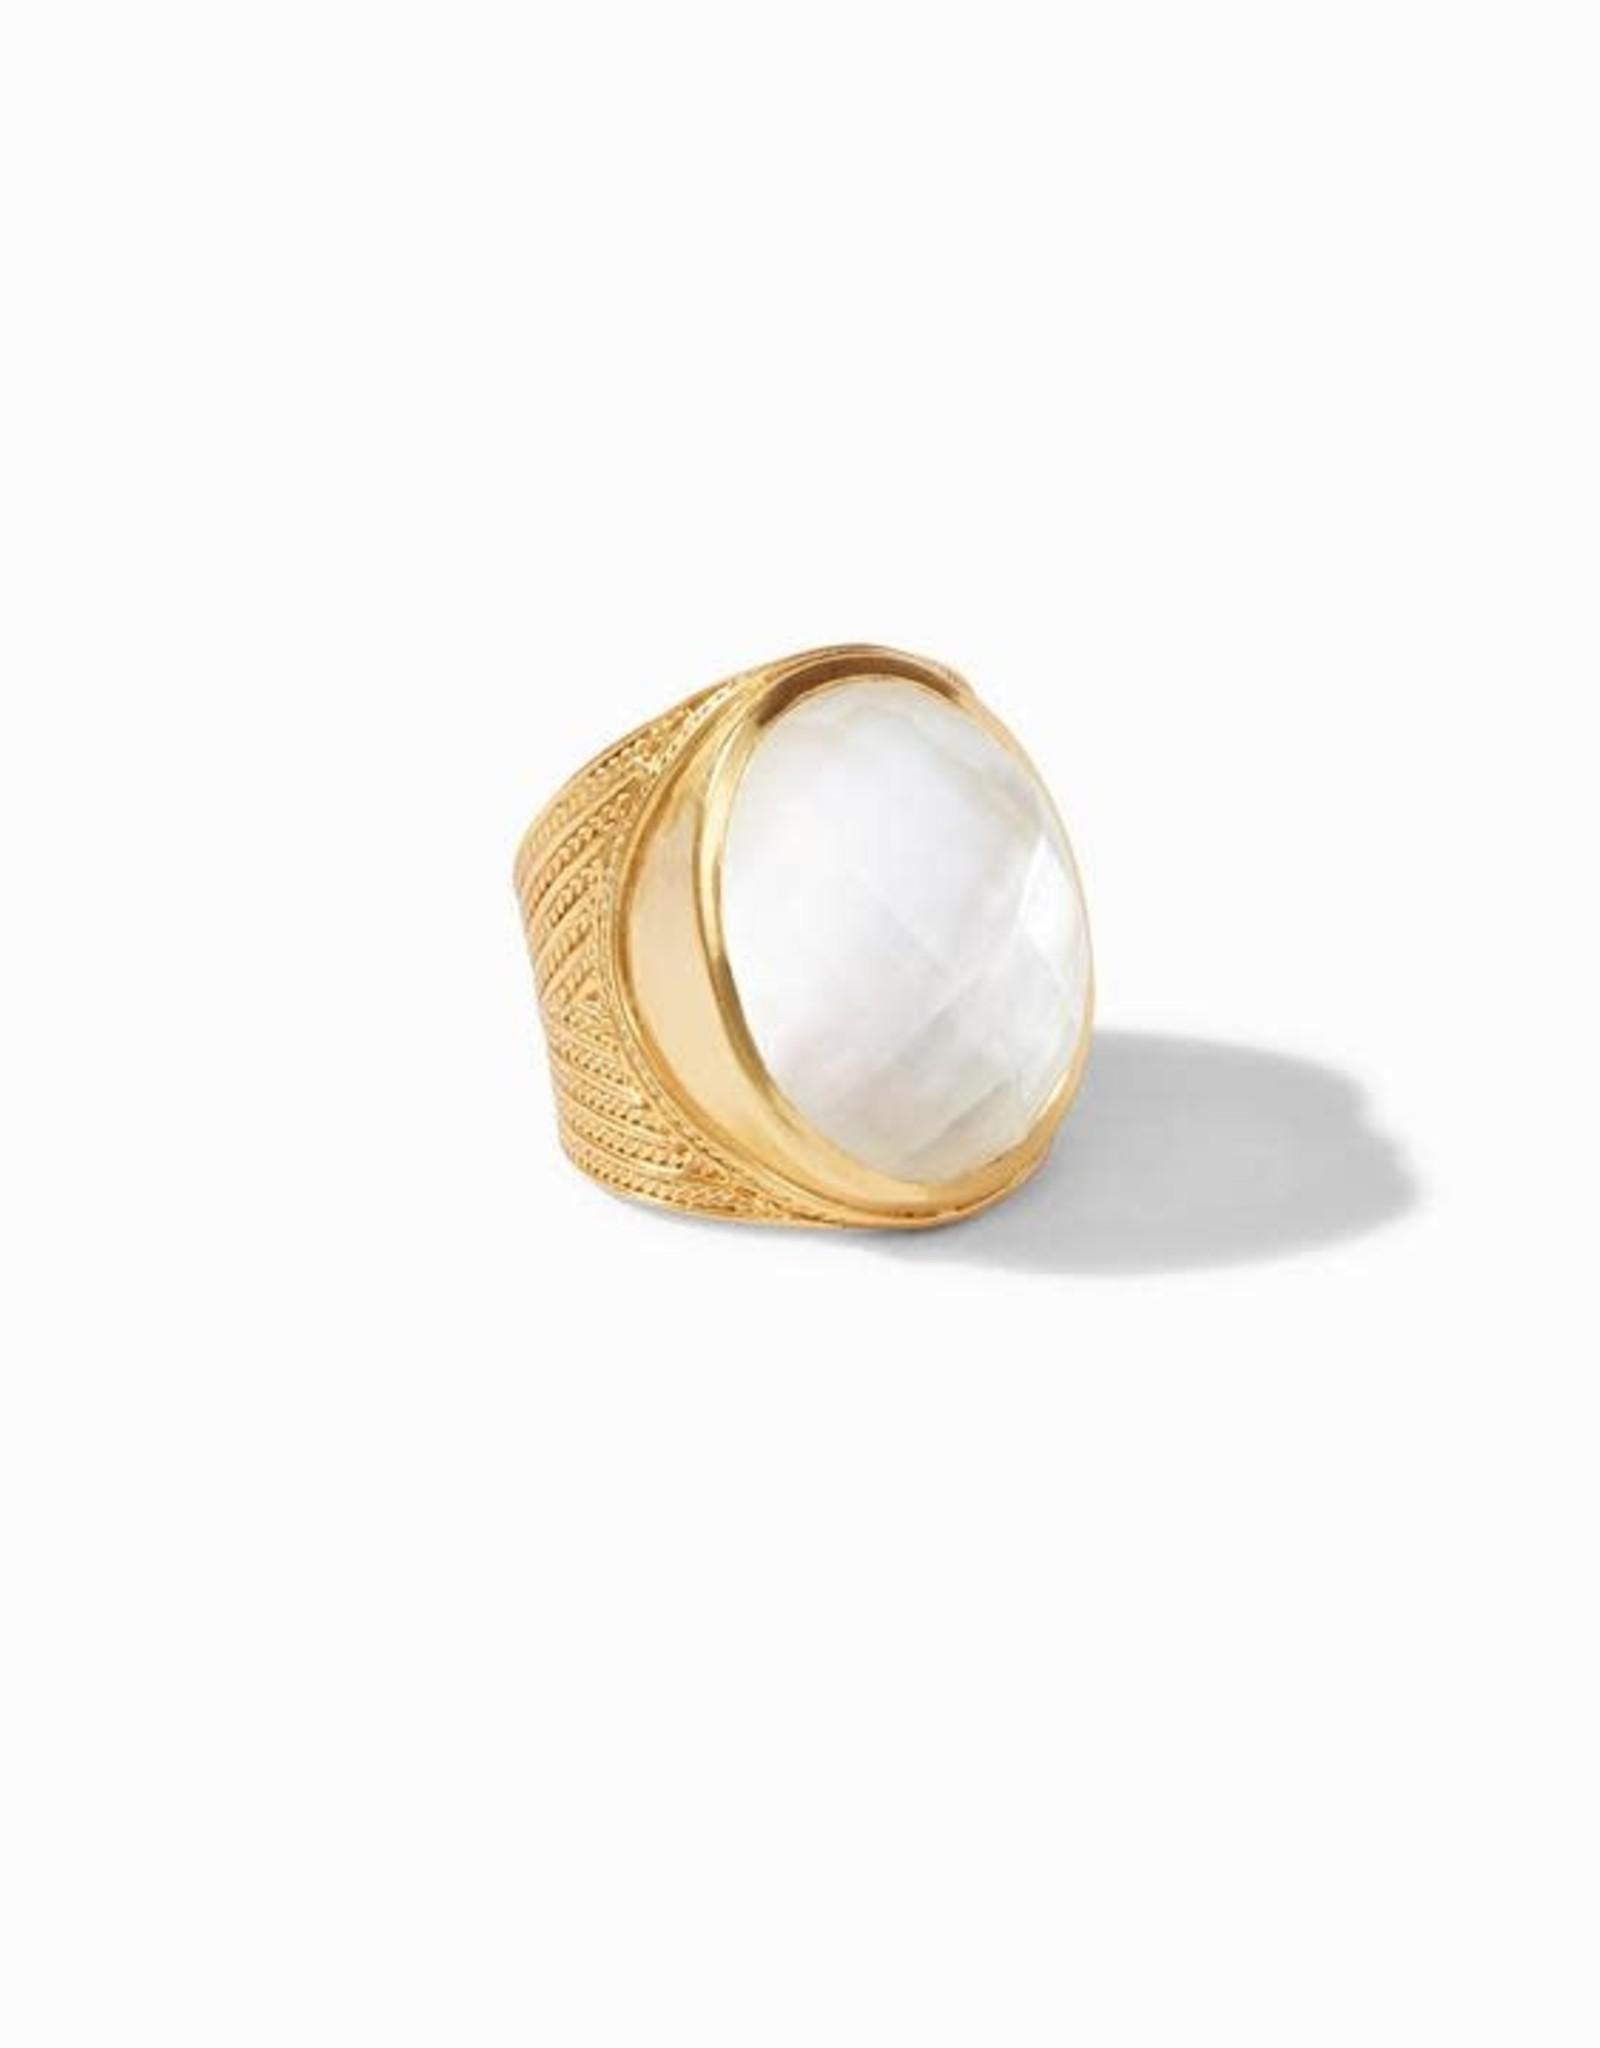 Julie Vos Verona Statement Ring Gold Iridescent Clear Crystal - Size 8 (Adjustable)